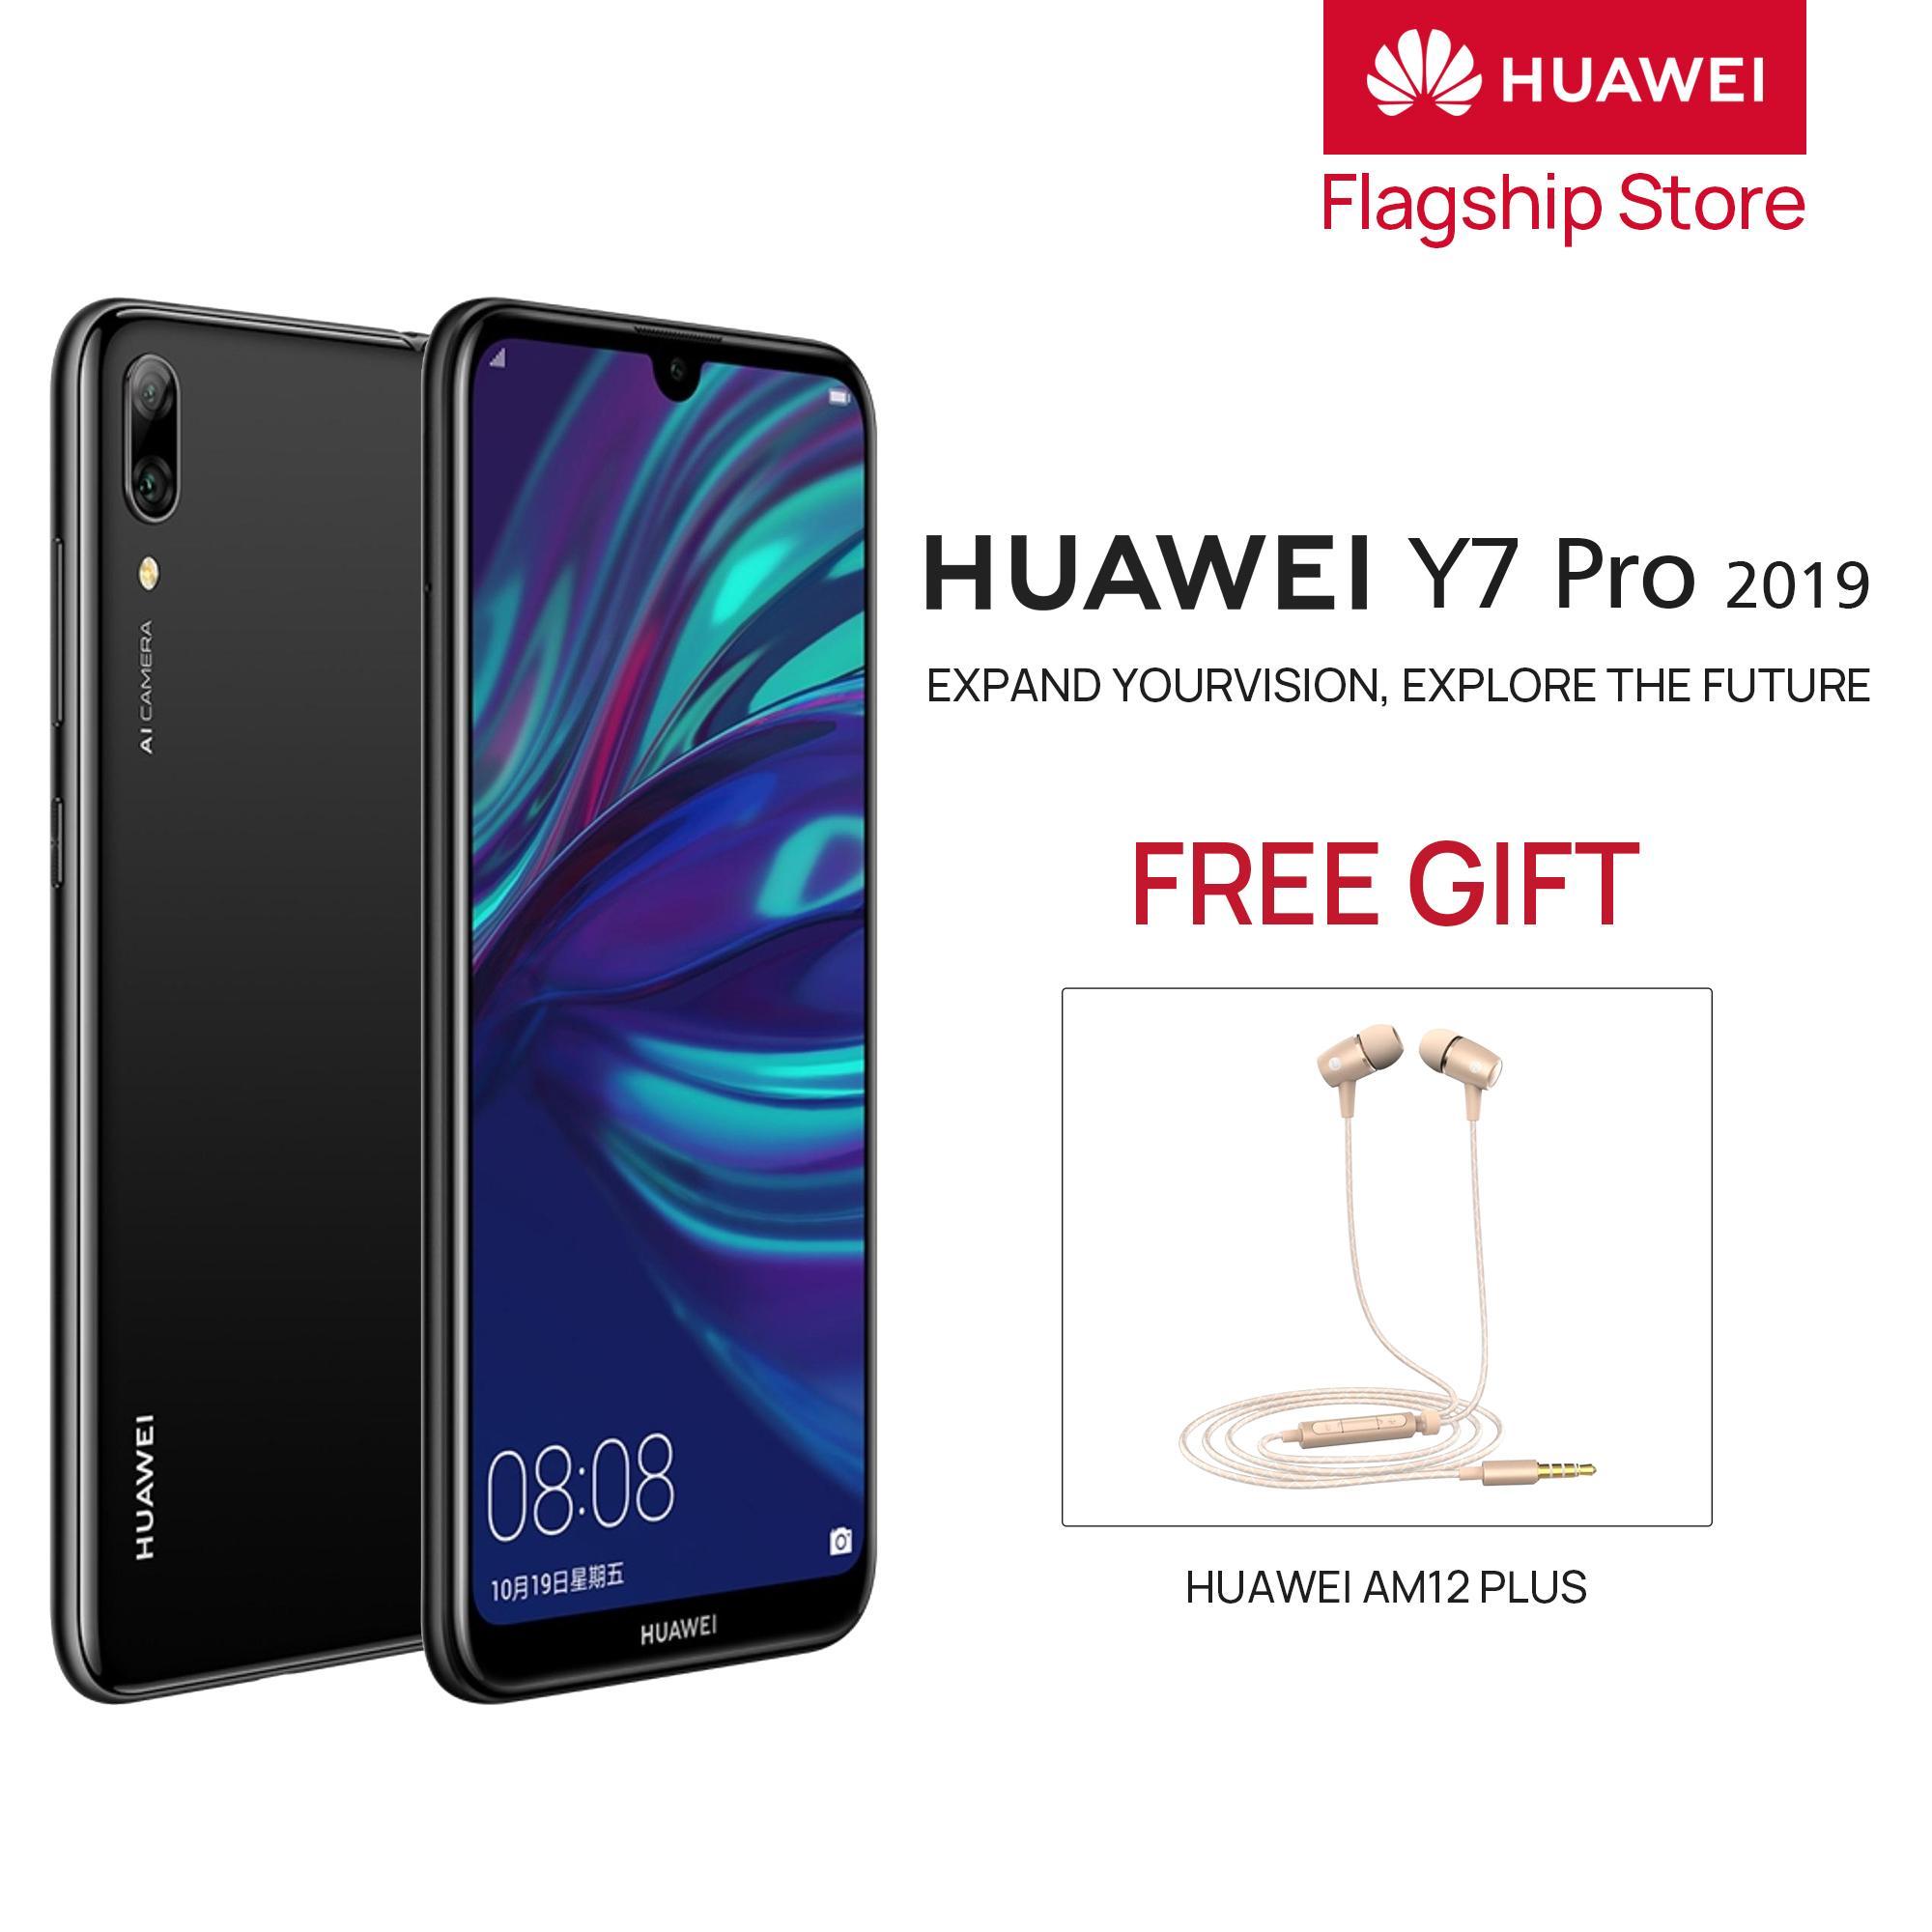 a4a518ff1 Huawei Y7 Pro 2019 32GB — 3GB 6.26 inches HD+ Screen Smart Phone